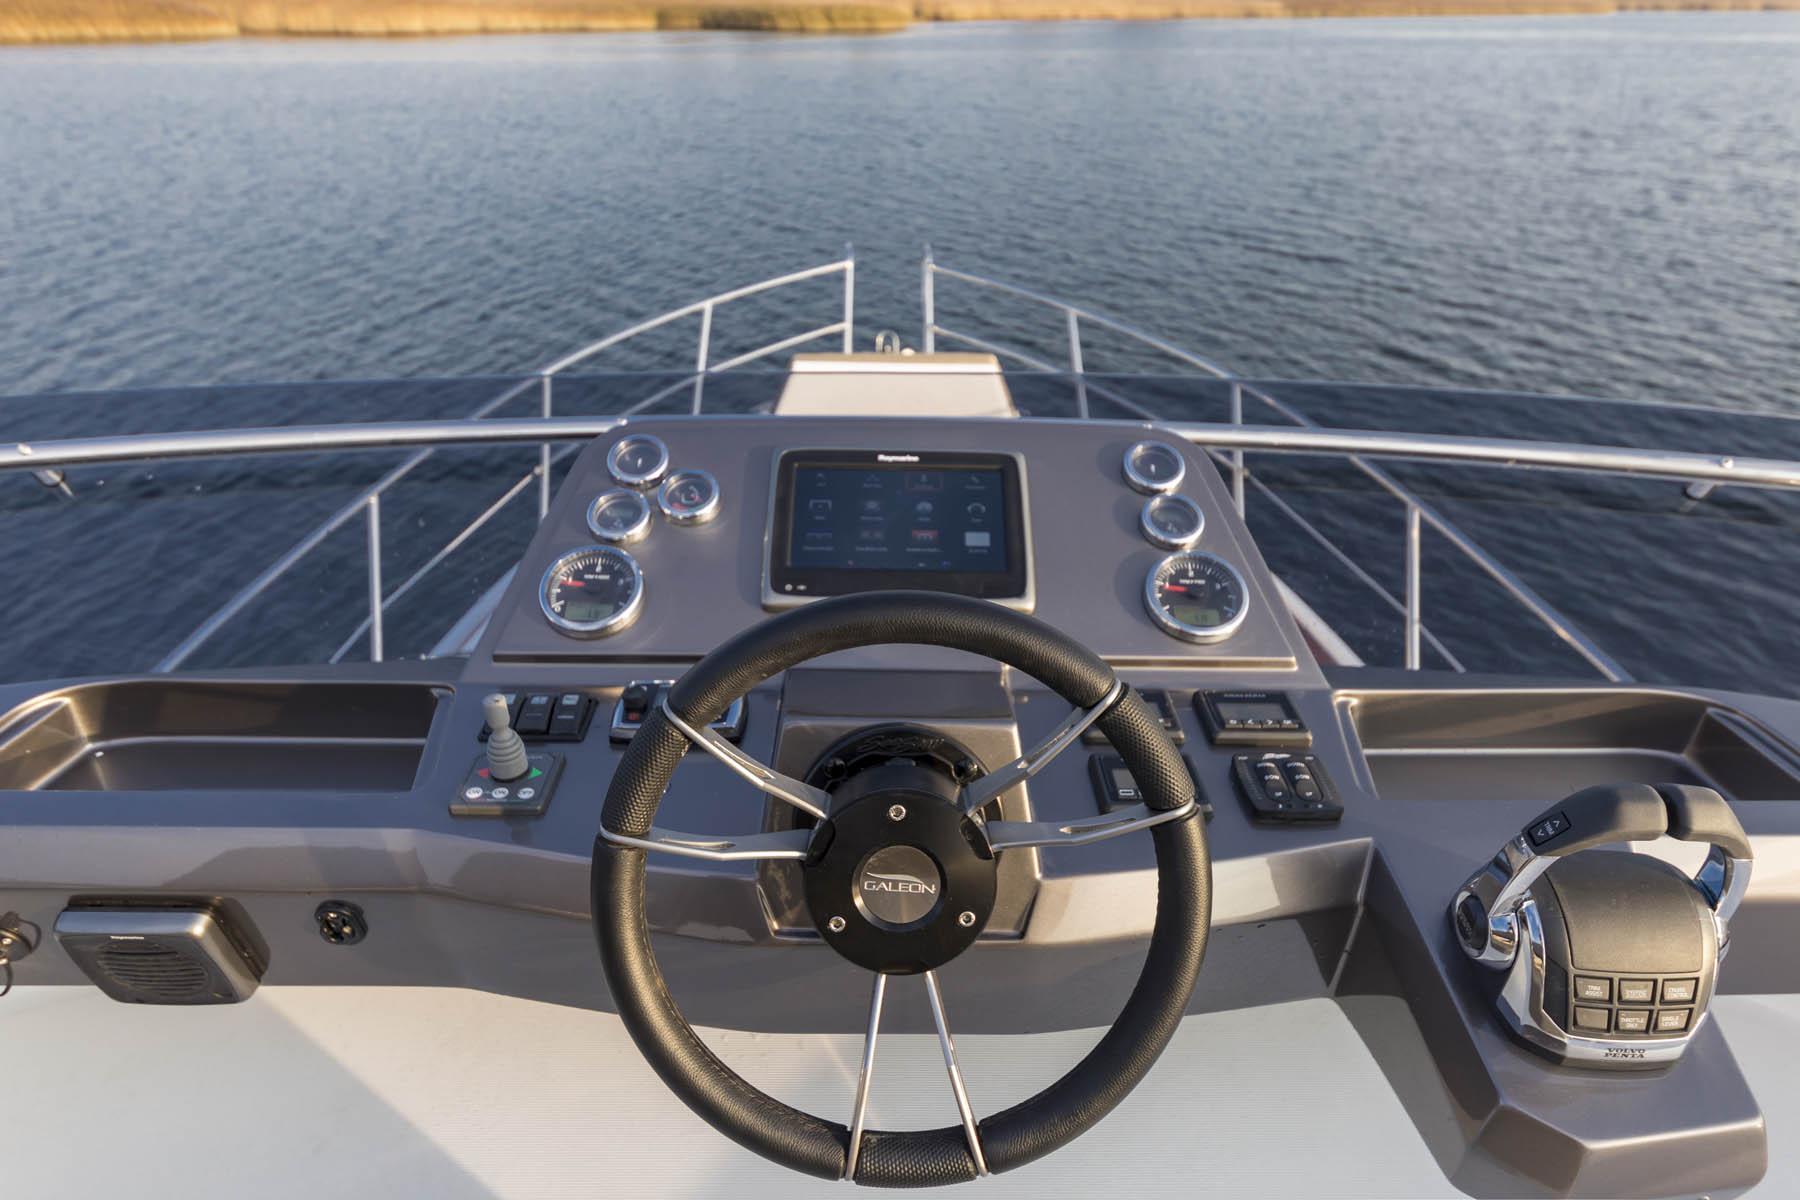 卡帝尔Galeon 360 FLY游艇,小身材也有明星范